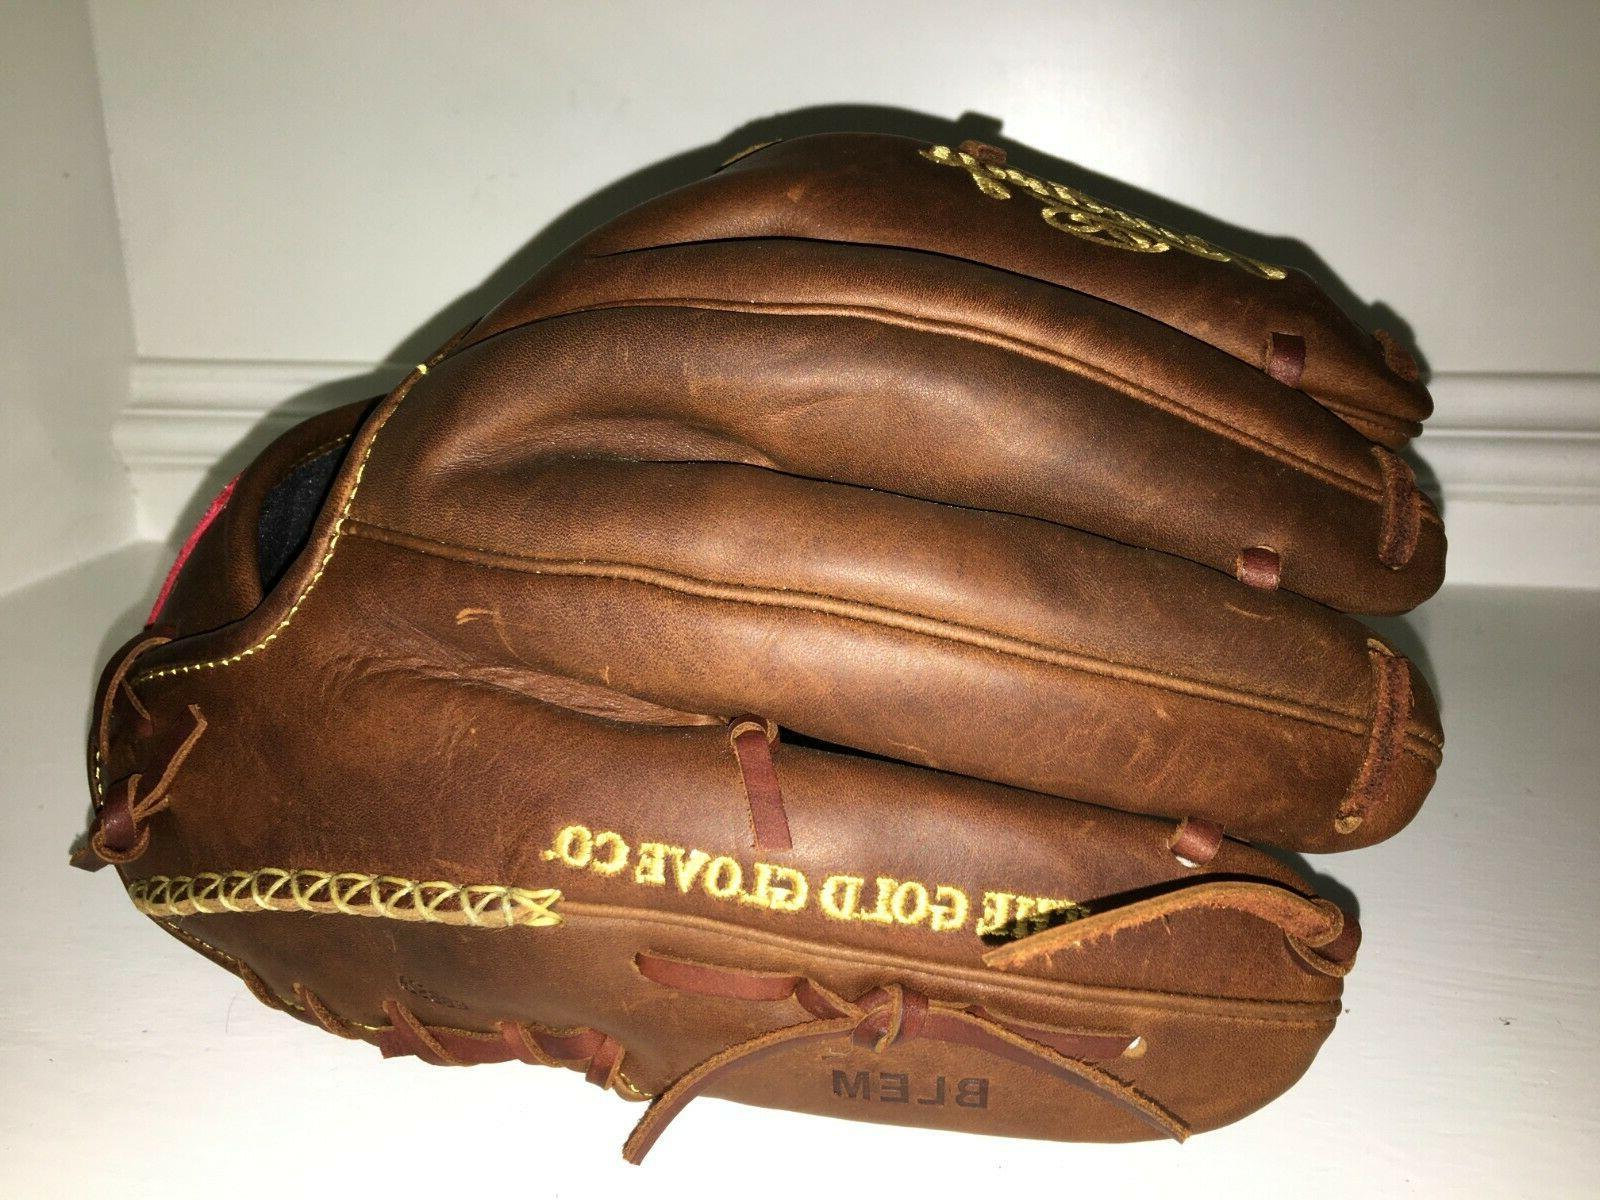 NEW Rawlings Heart Baseball Glove FING SHIFT